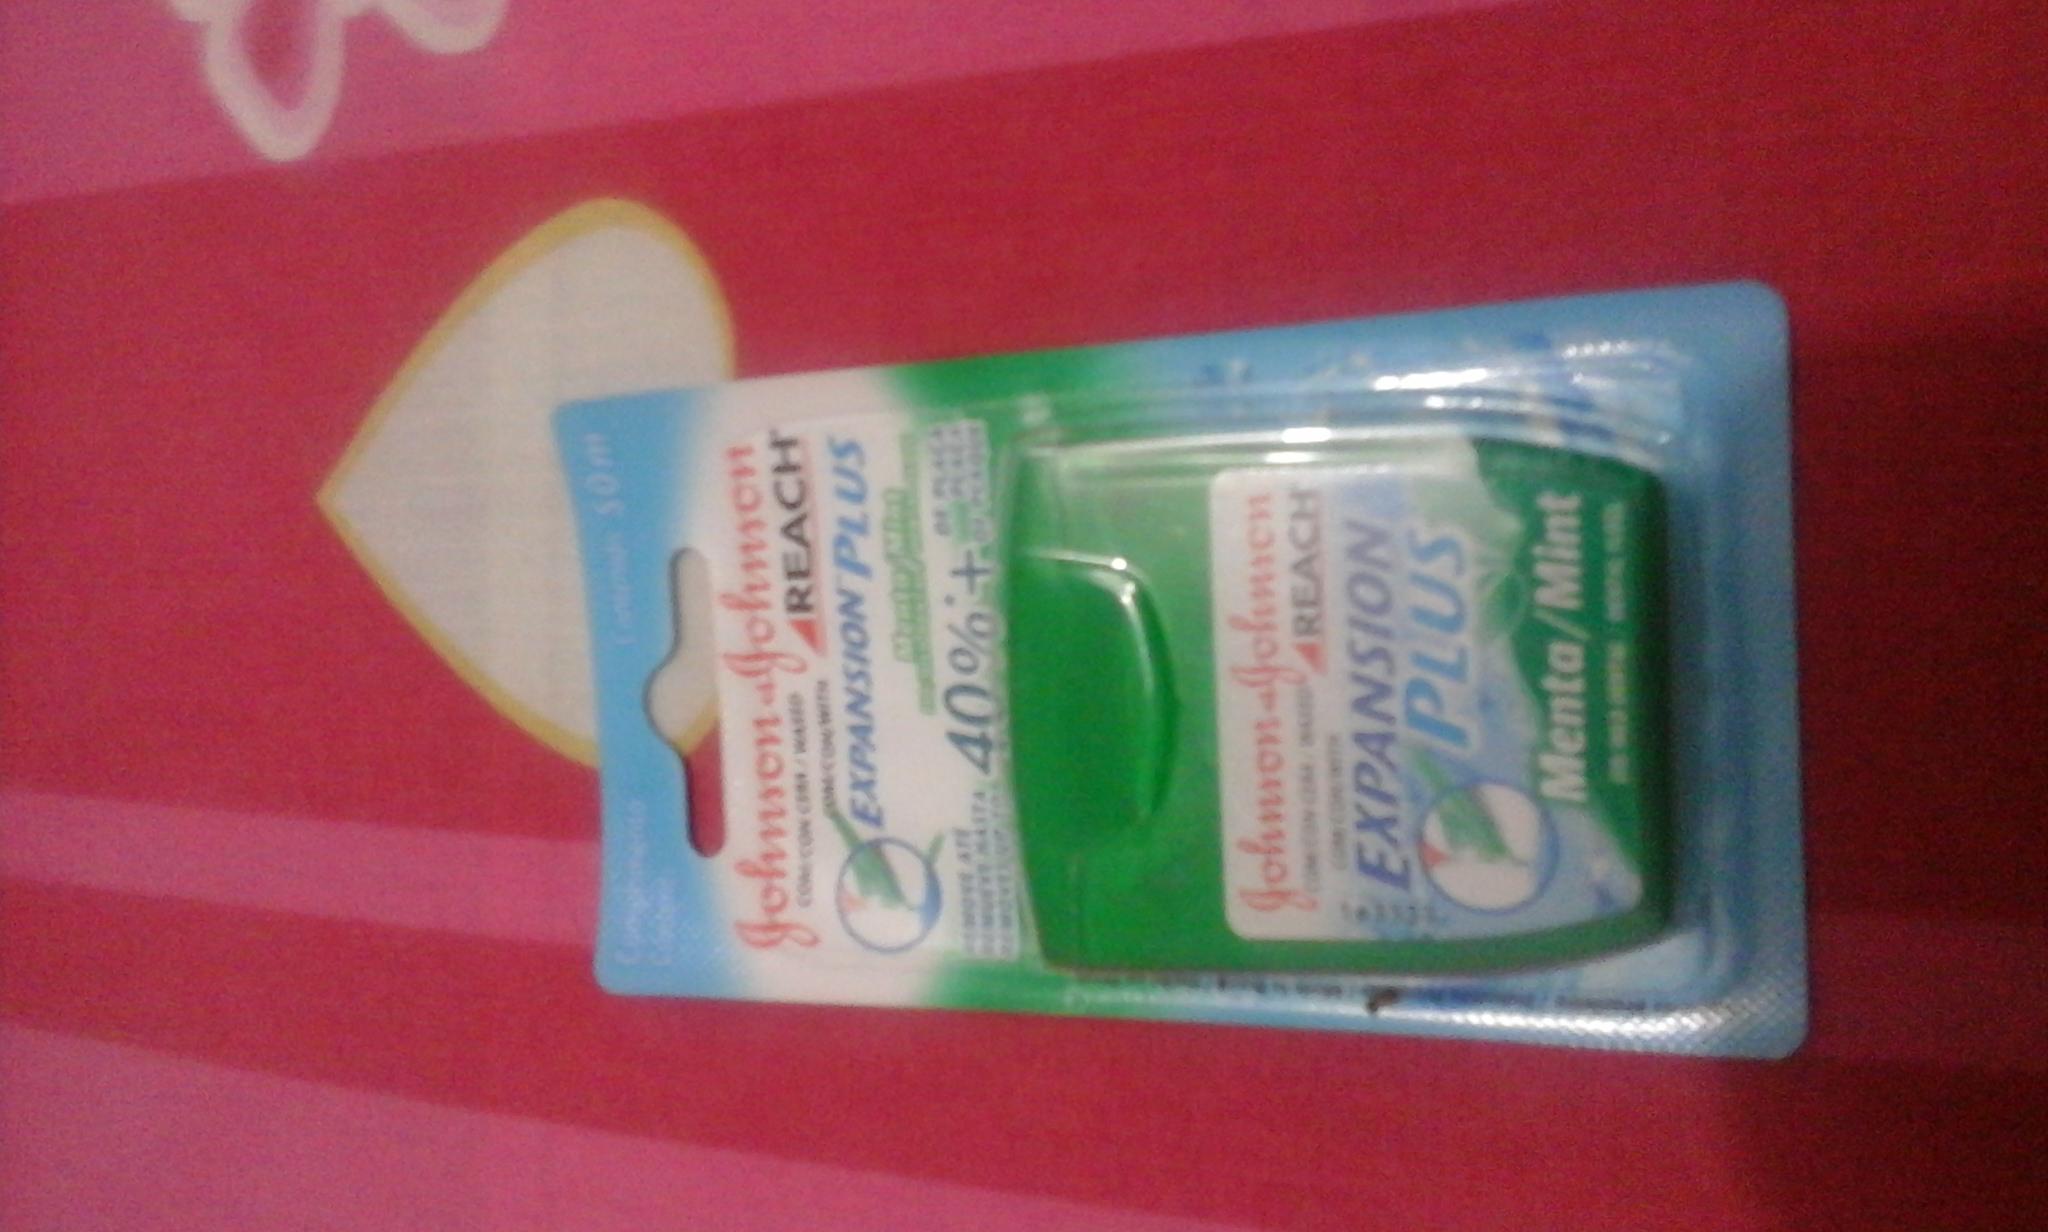 REACH® Dental Floss uploaded by martha aurelia J.